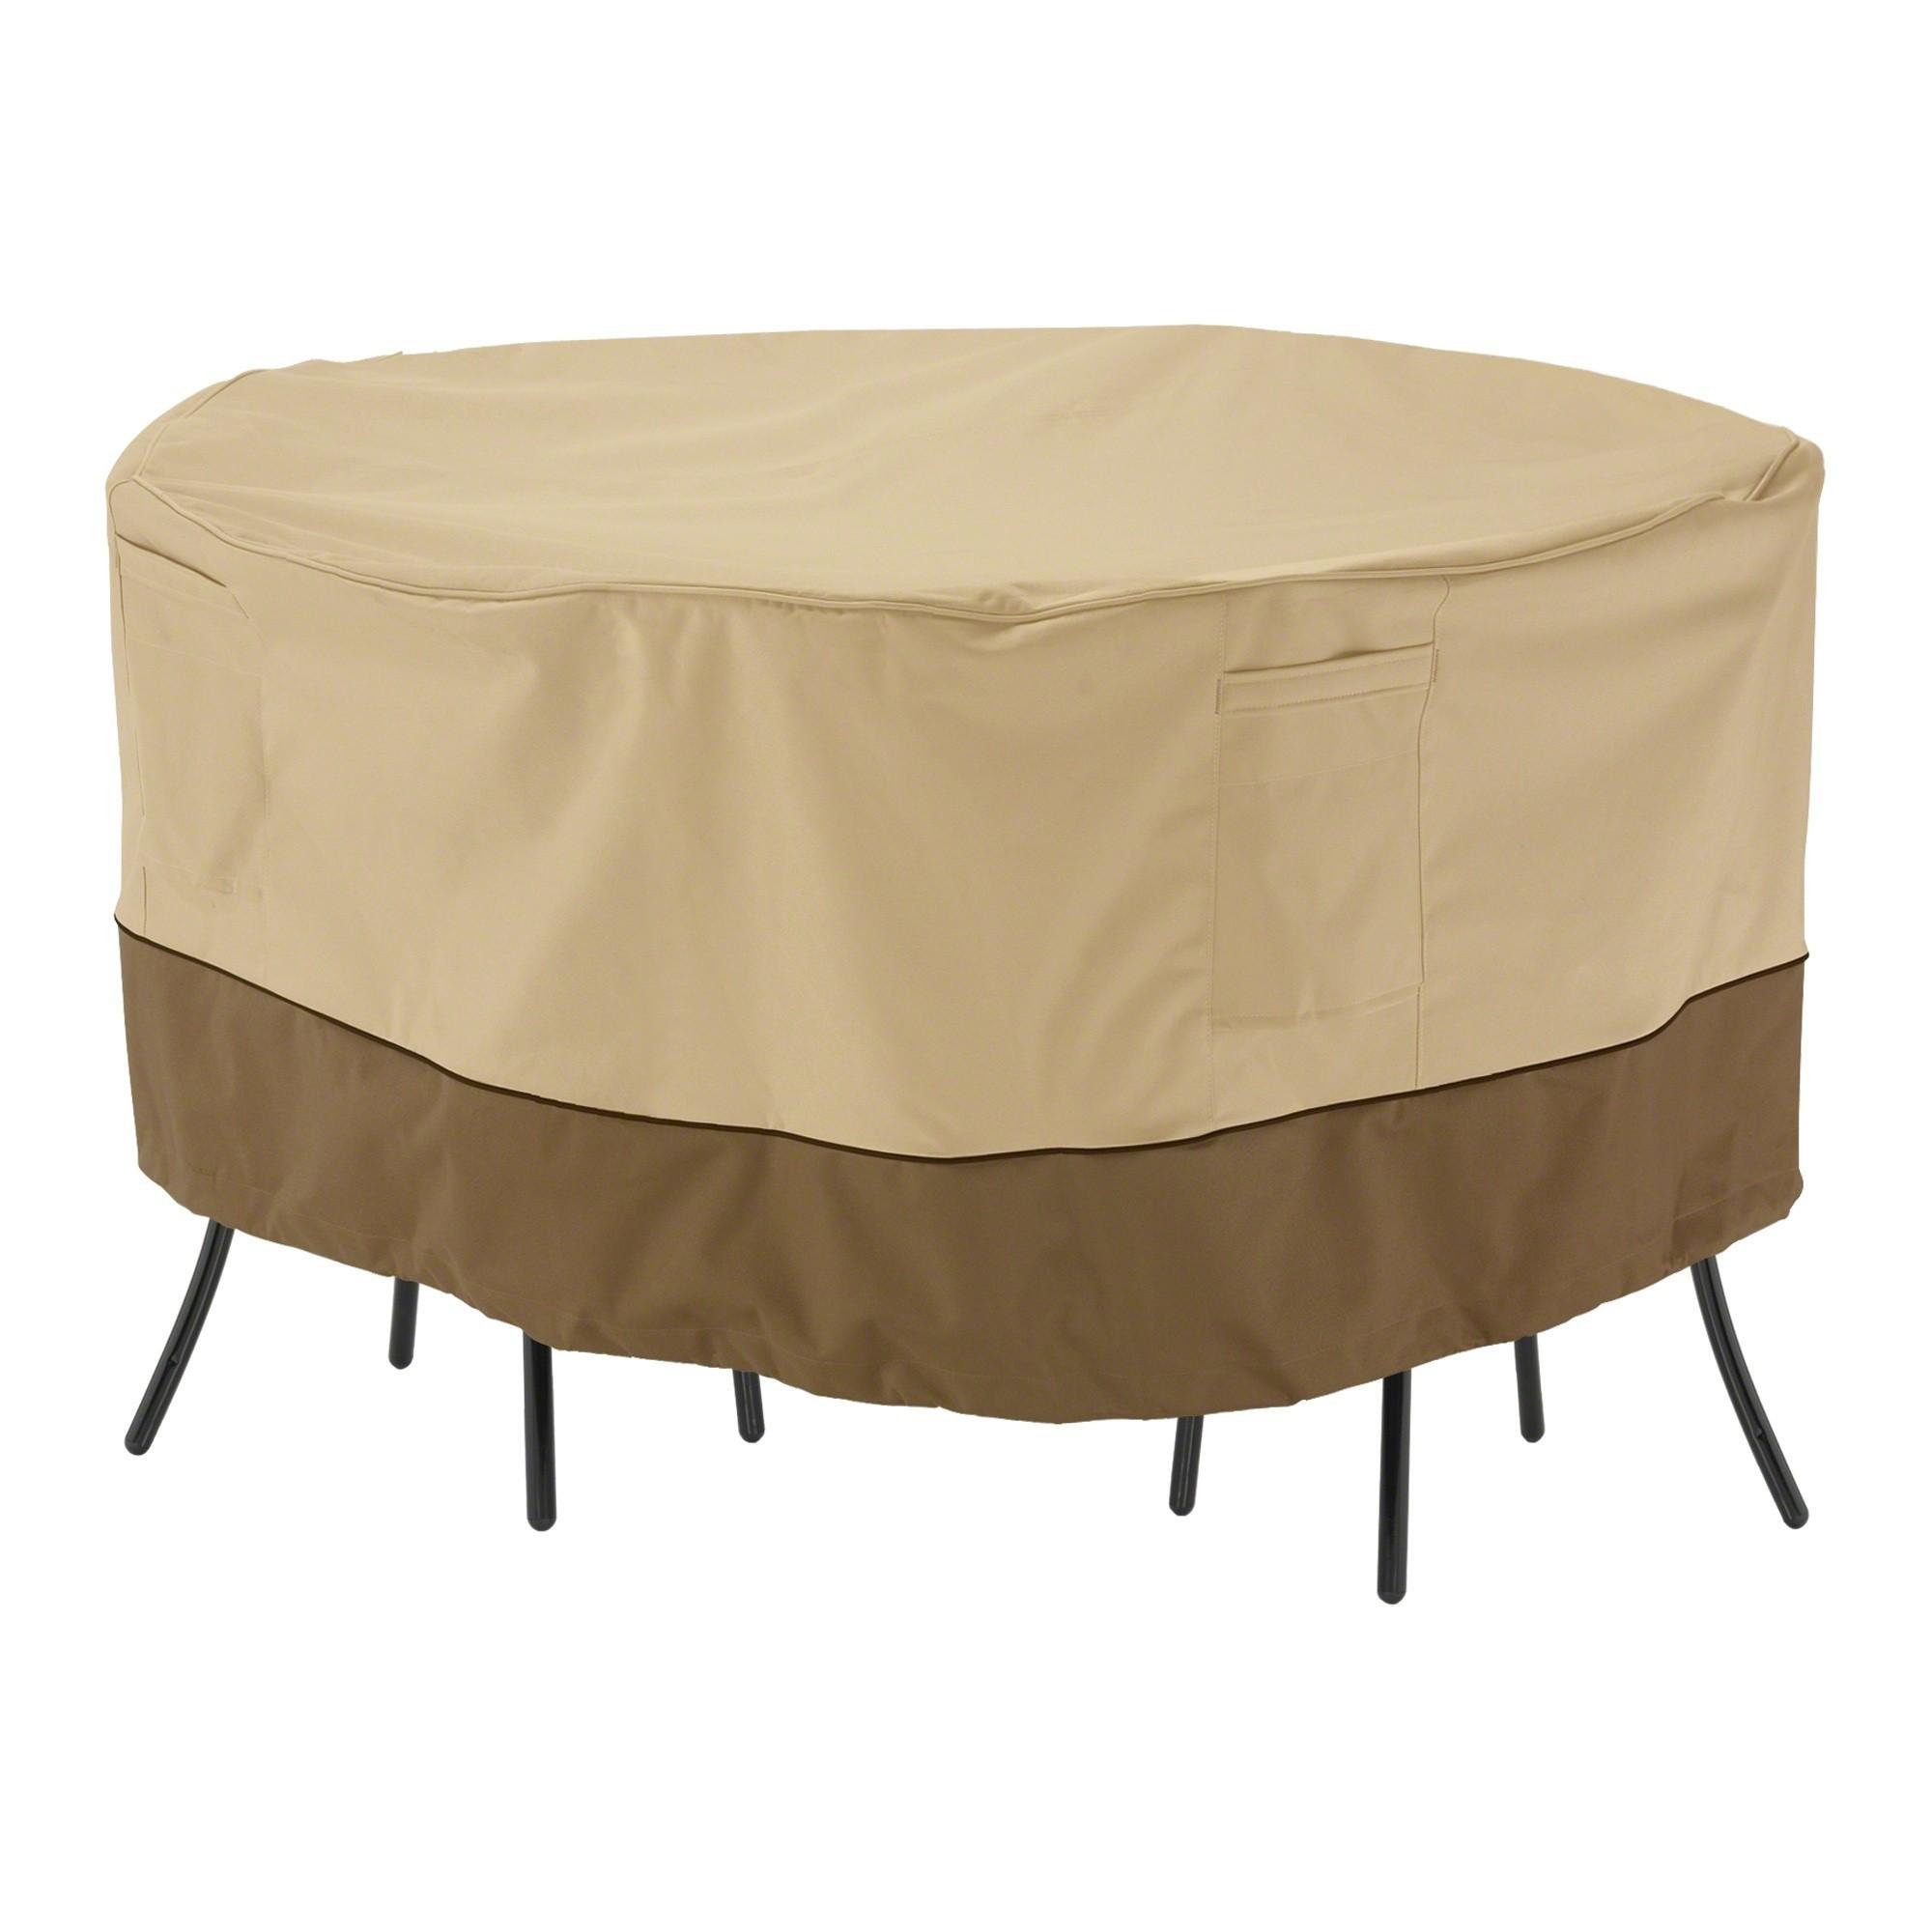 veranda patio bistro round table and chair cover 52 dia x 23 rh pinterest com